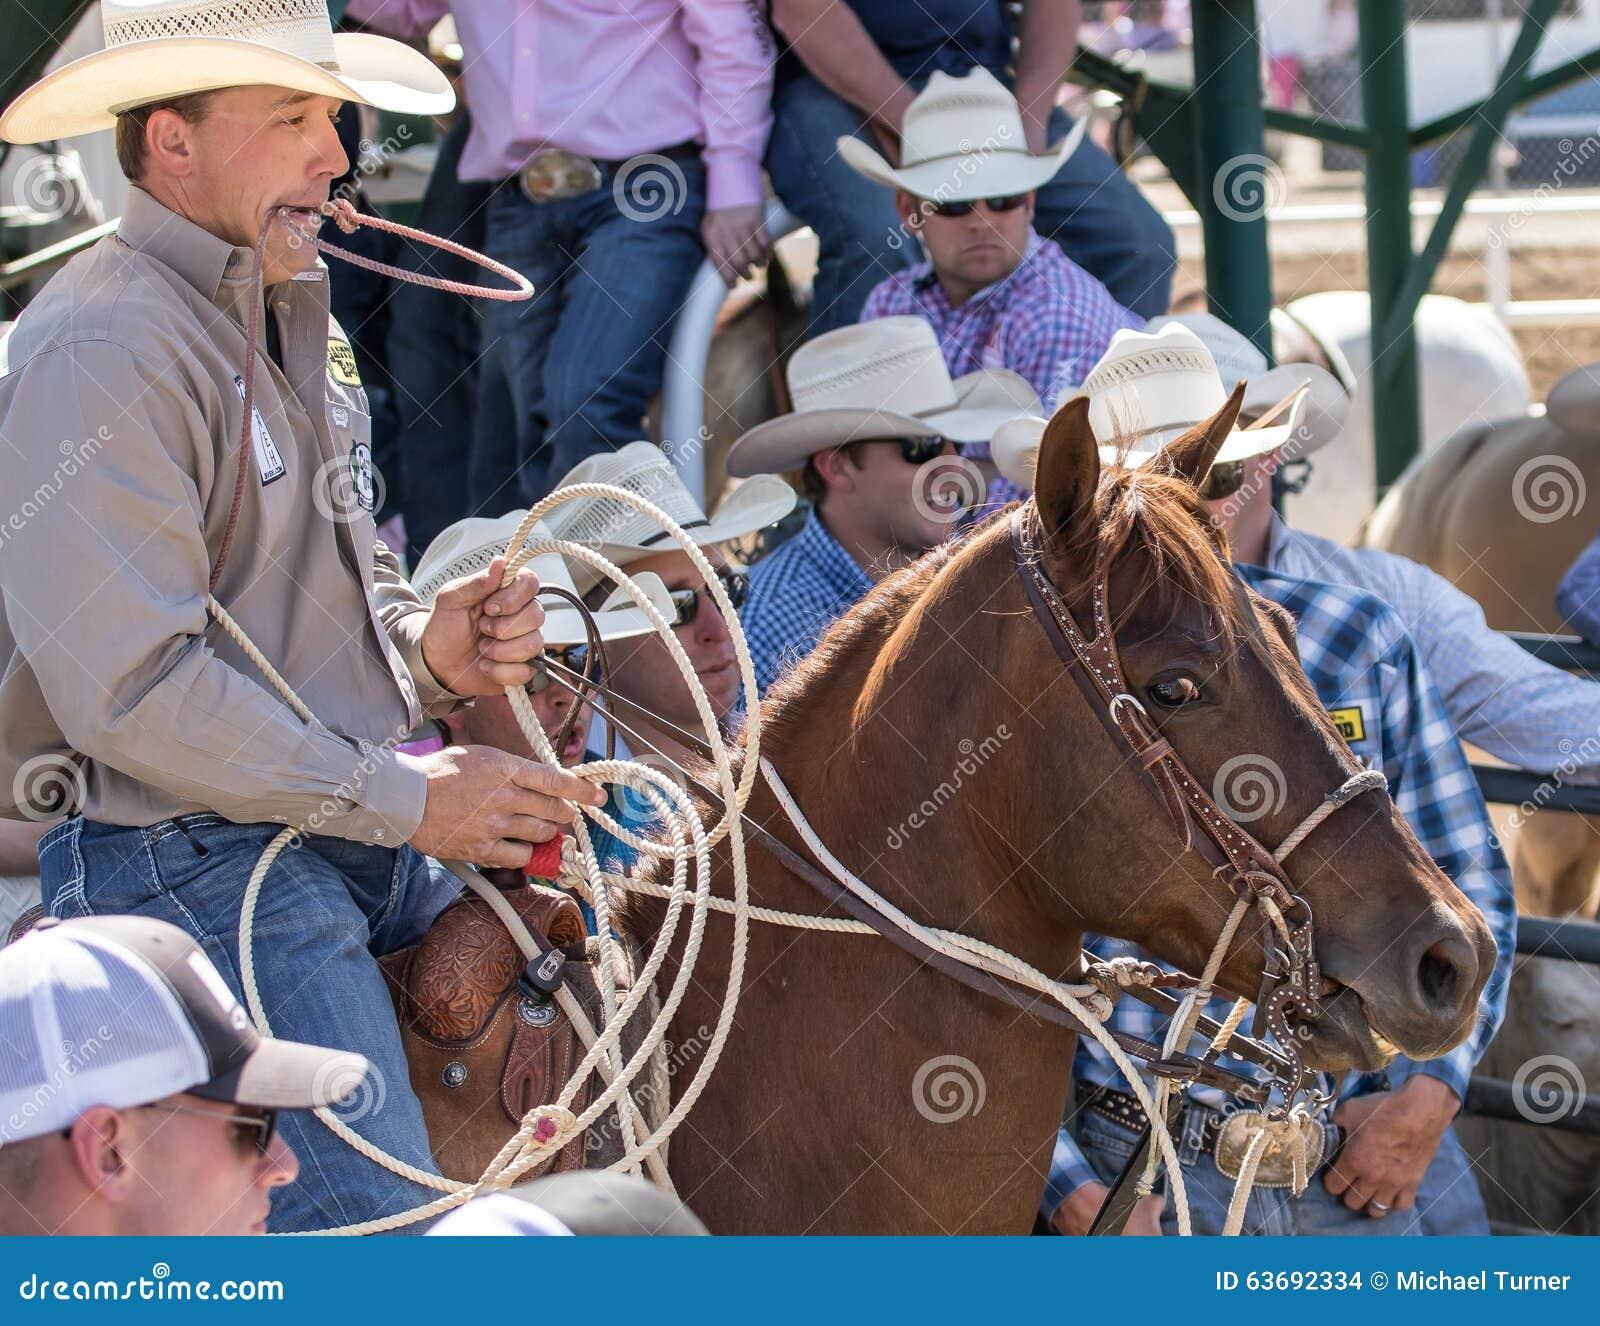 Calf Roping Cowboy Editorial Stock Image Image Of April